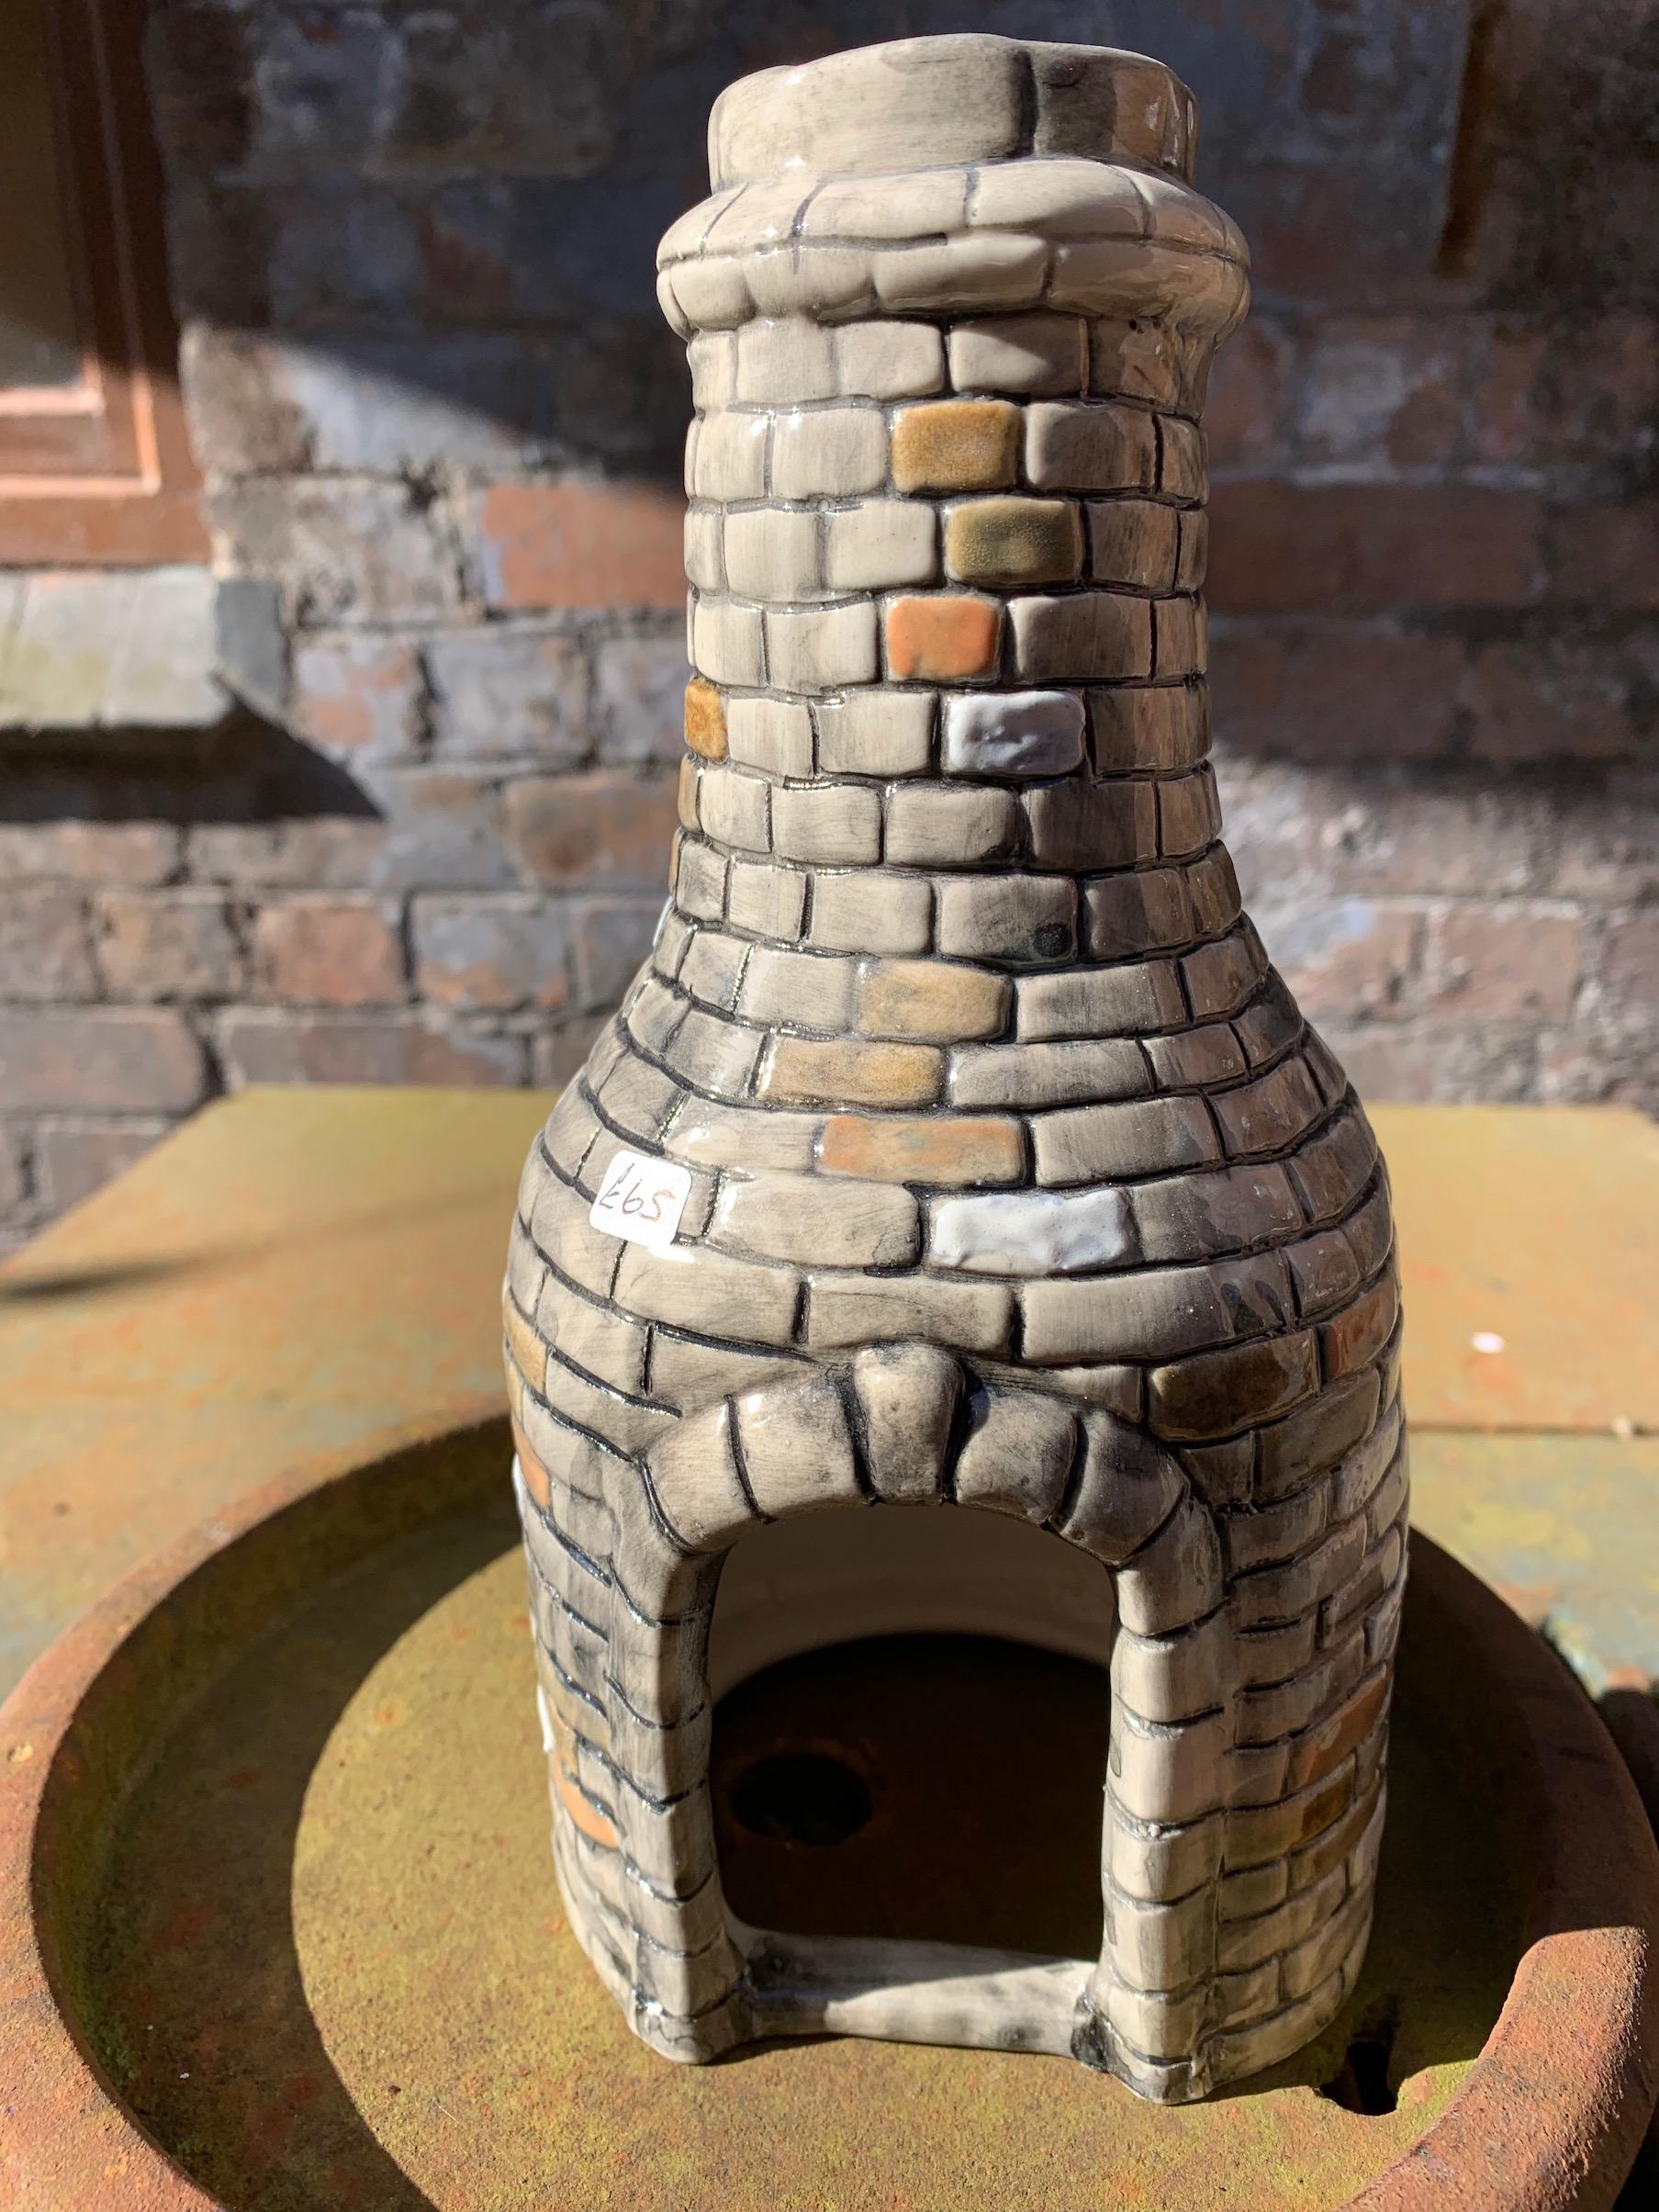 Large Bottle Kiln